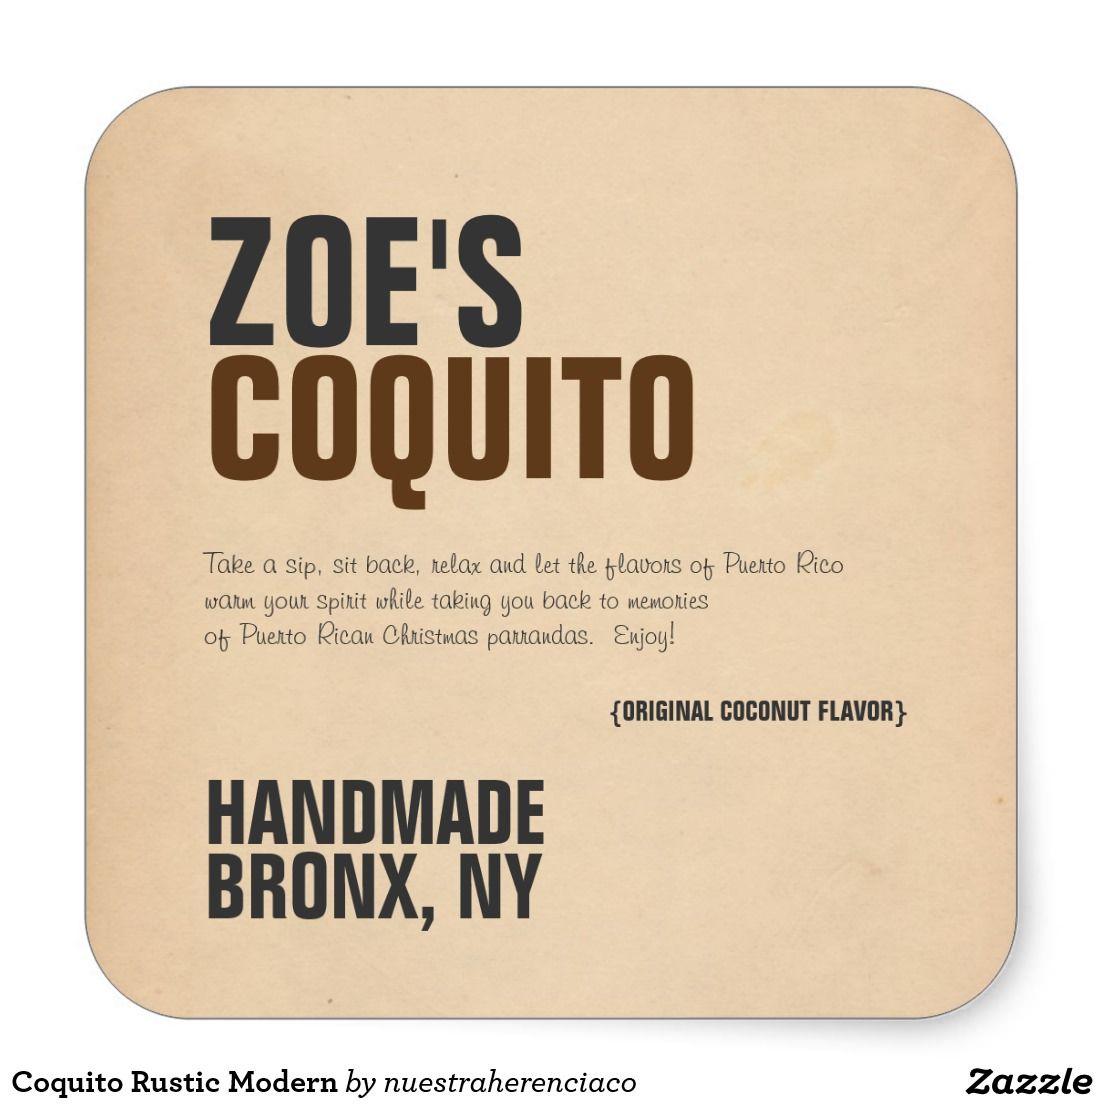 Personalized coquito rustic modern square stickers labels coquito de puerto rico etiquetas y stickers para botellas de coquito de puerto rico diseño